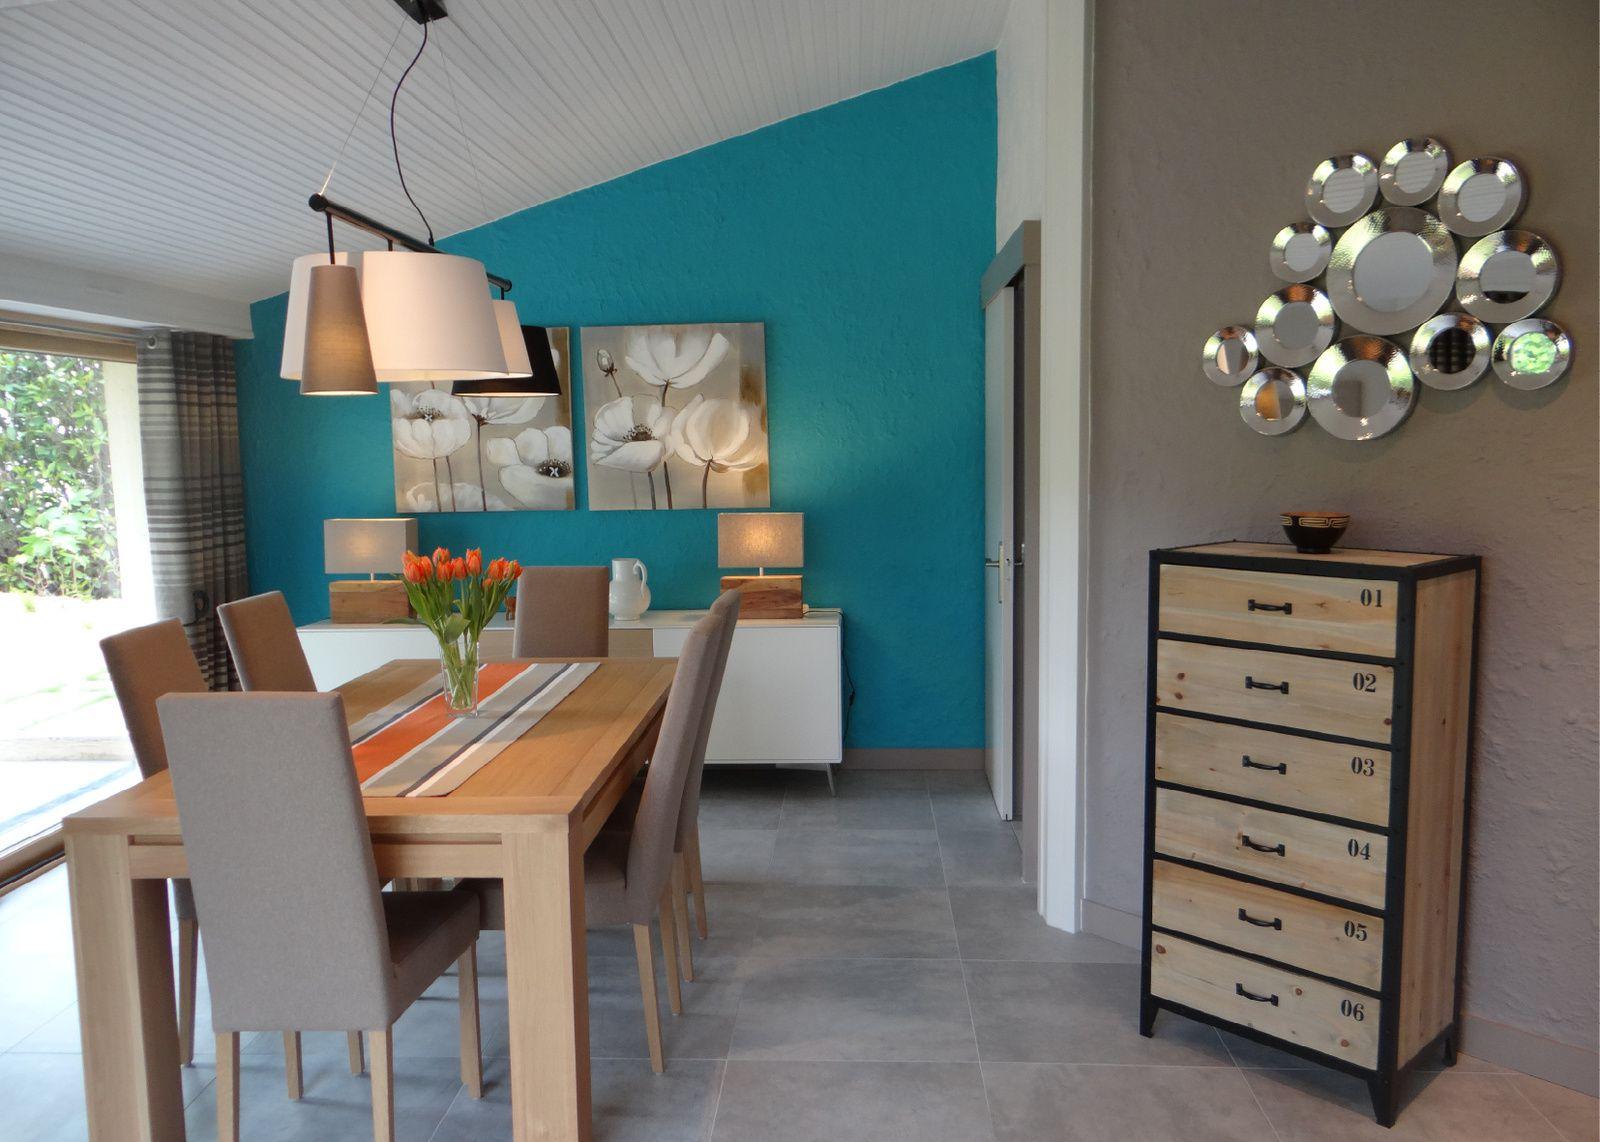 Fabriquer meuble salle de bain avec meuble cuisine for Cuisine blanche mur bleu canard